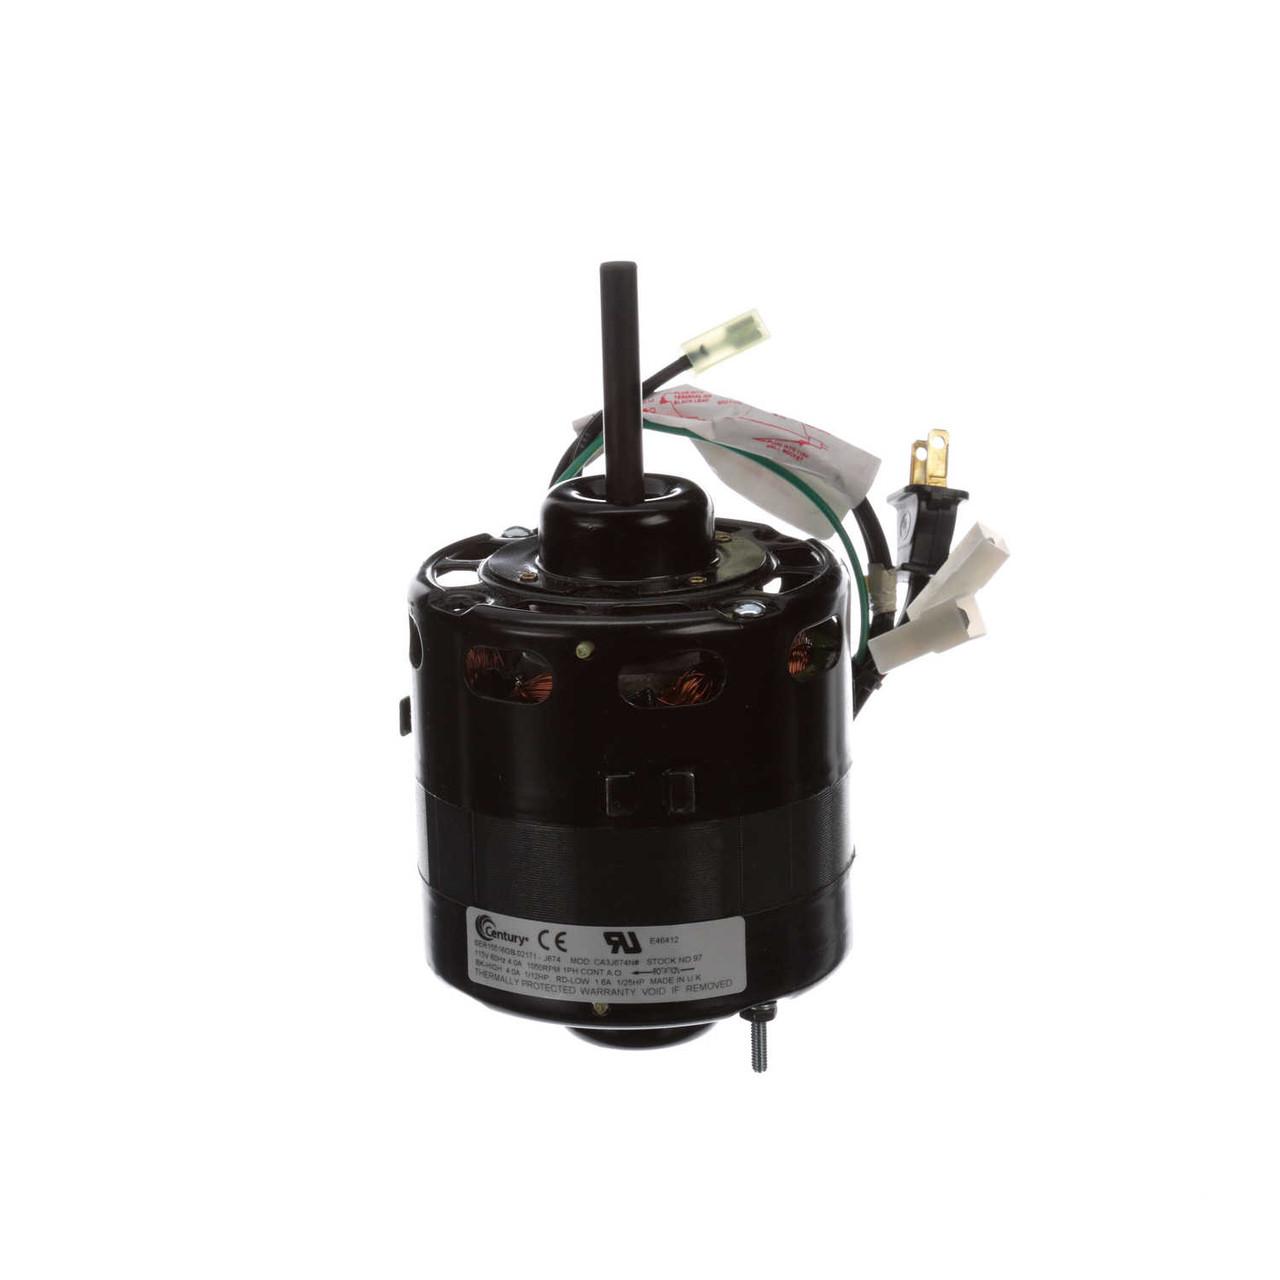 Nordyne (326P113) Furnace Motor 1/8 hp 1050 RPM 115V